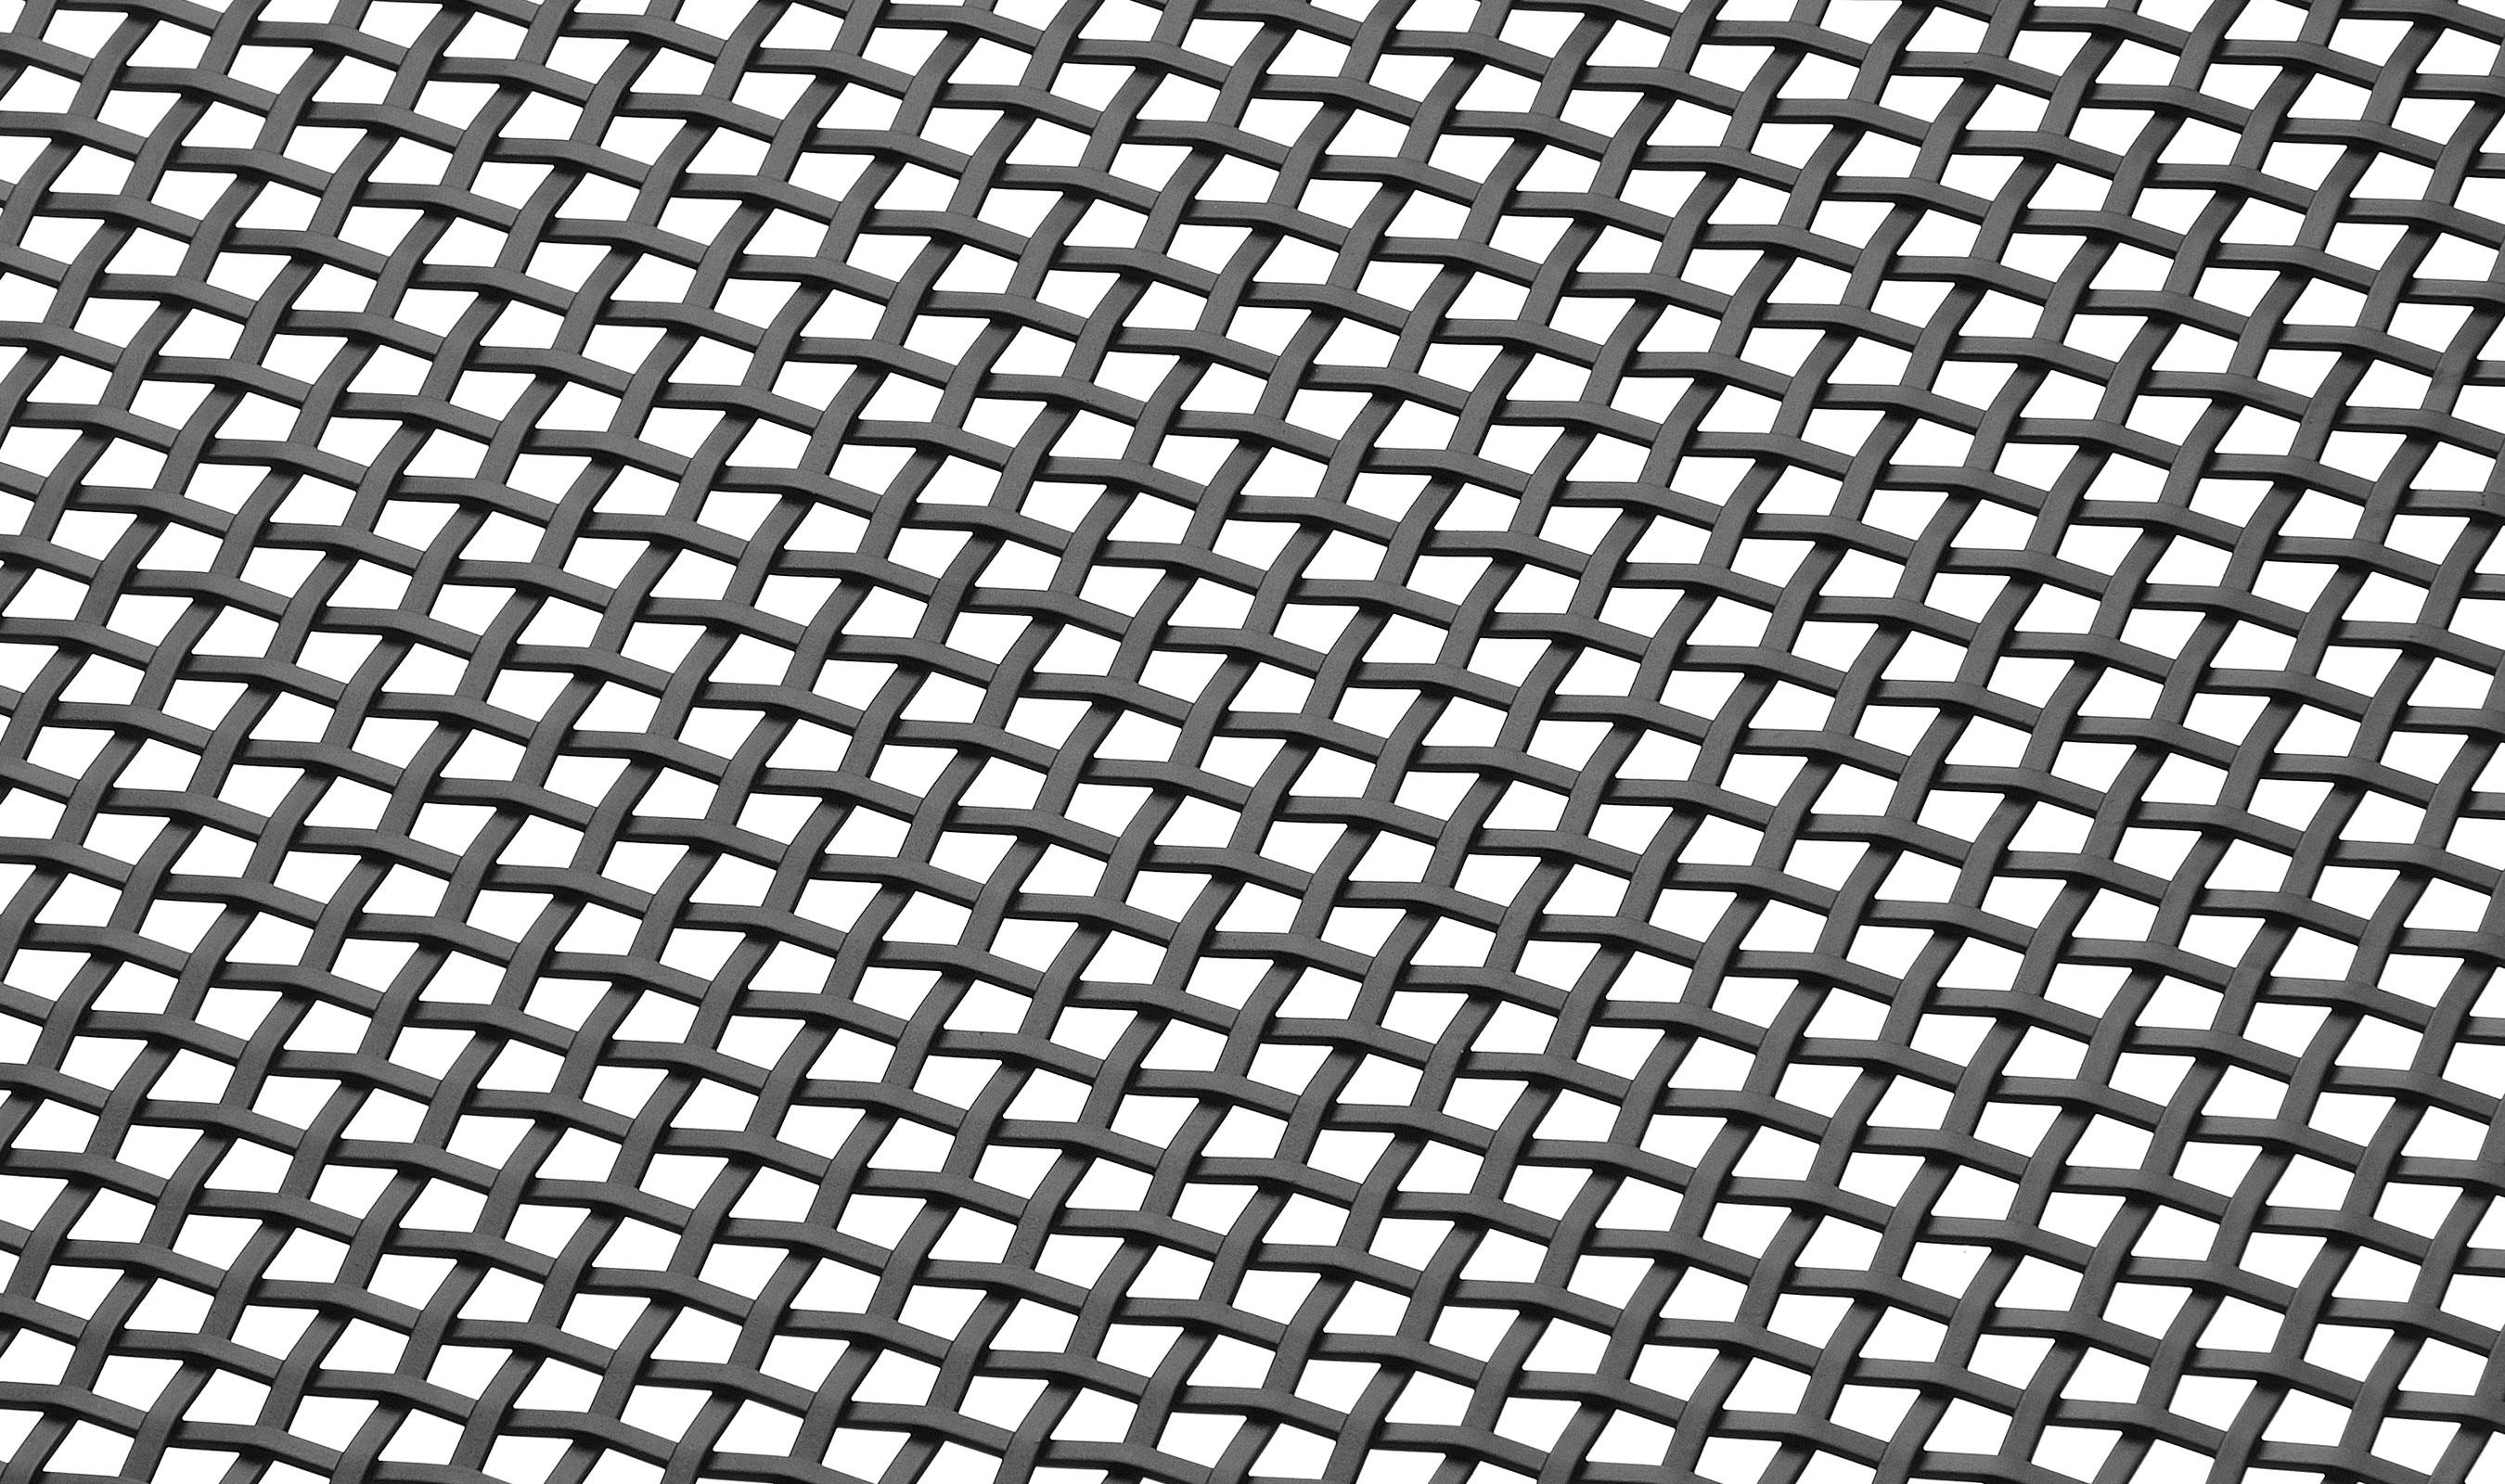 S-50 Dark Oxide wire mesh finish